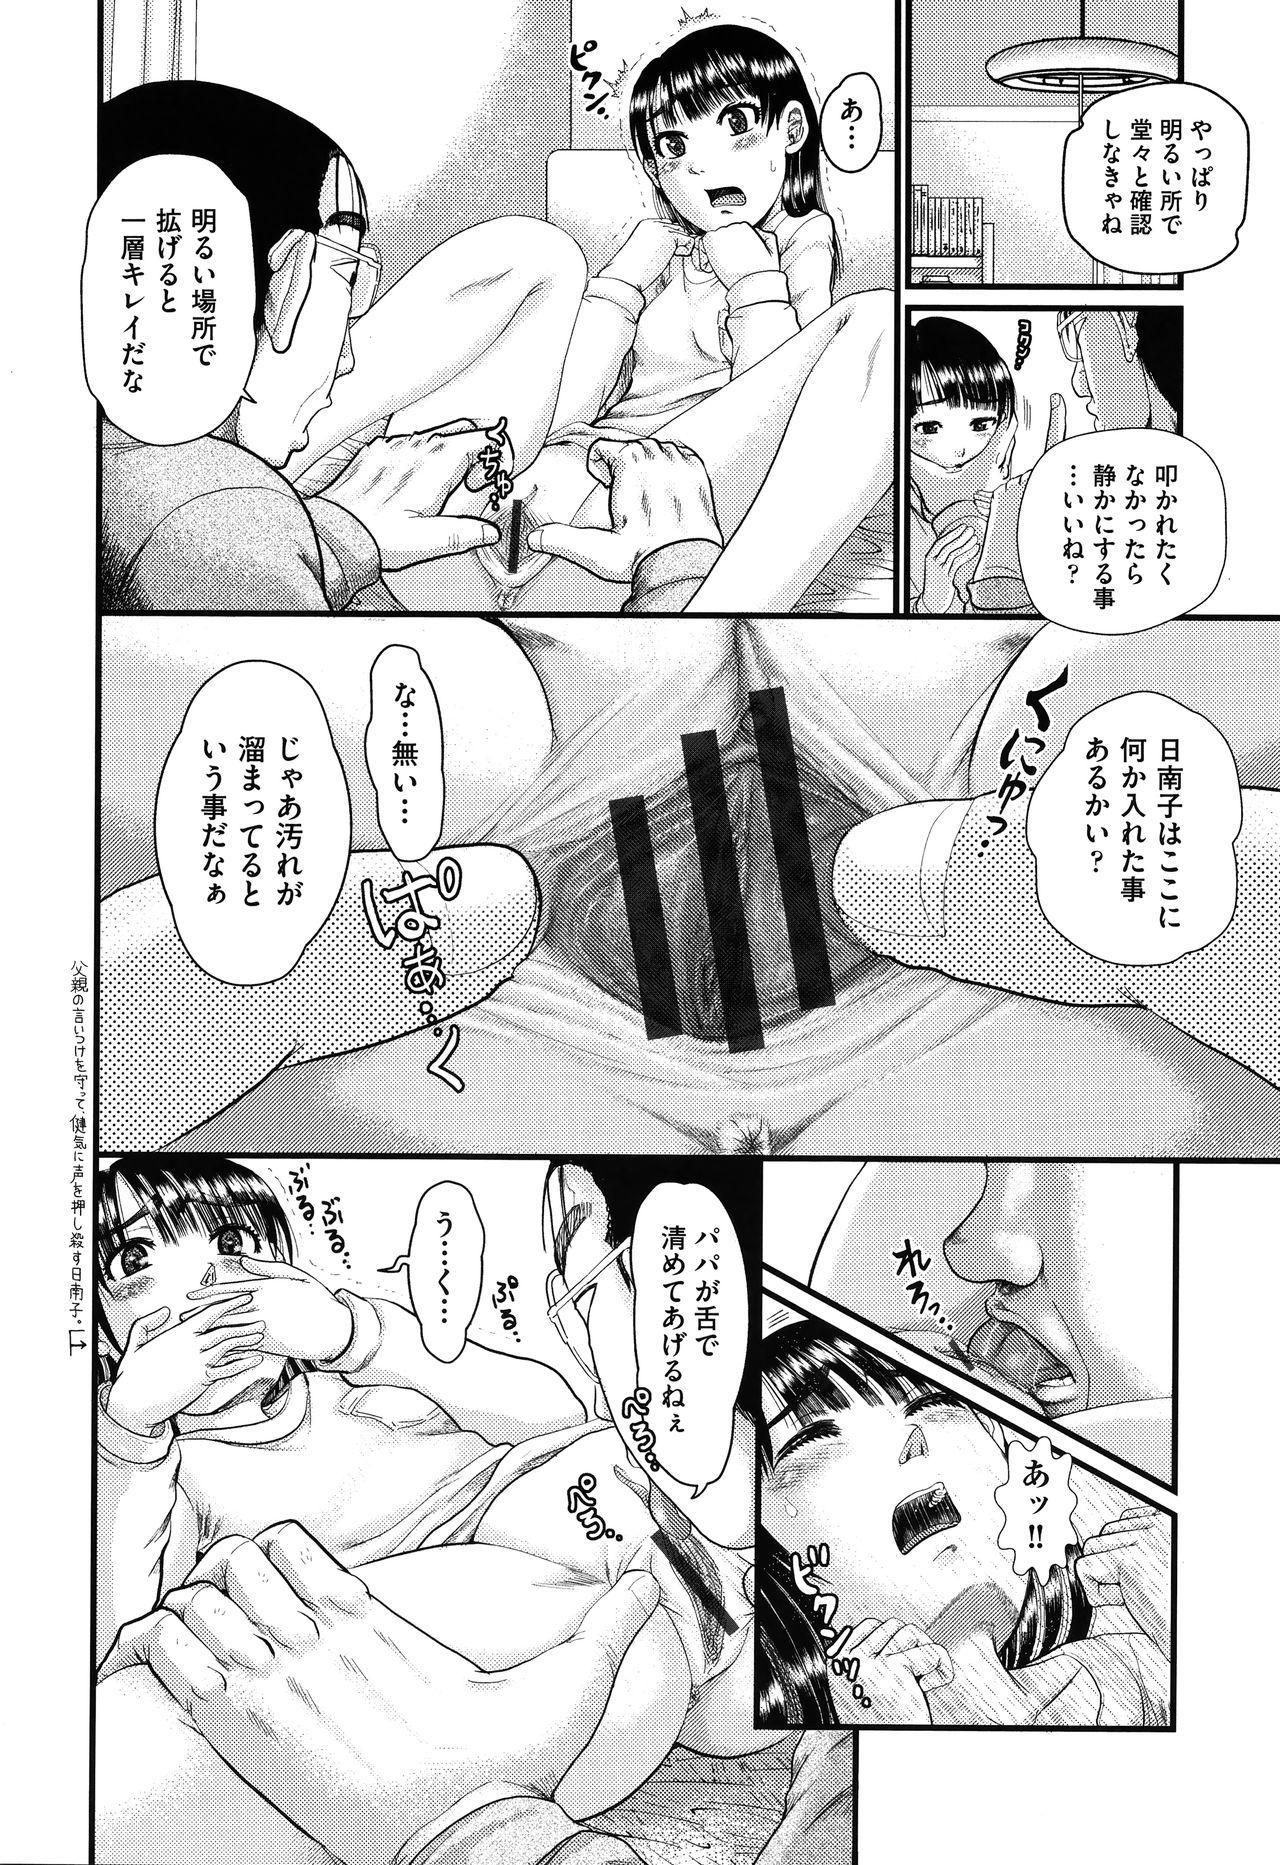 Shoujo Kumikyoku 17 94